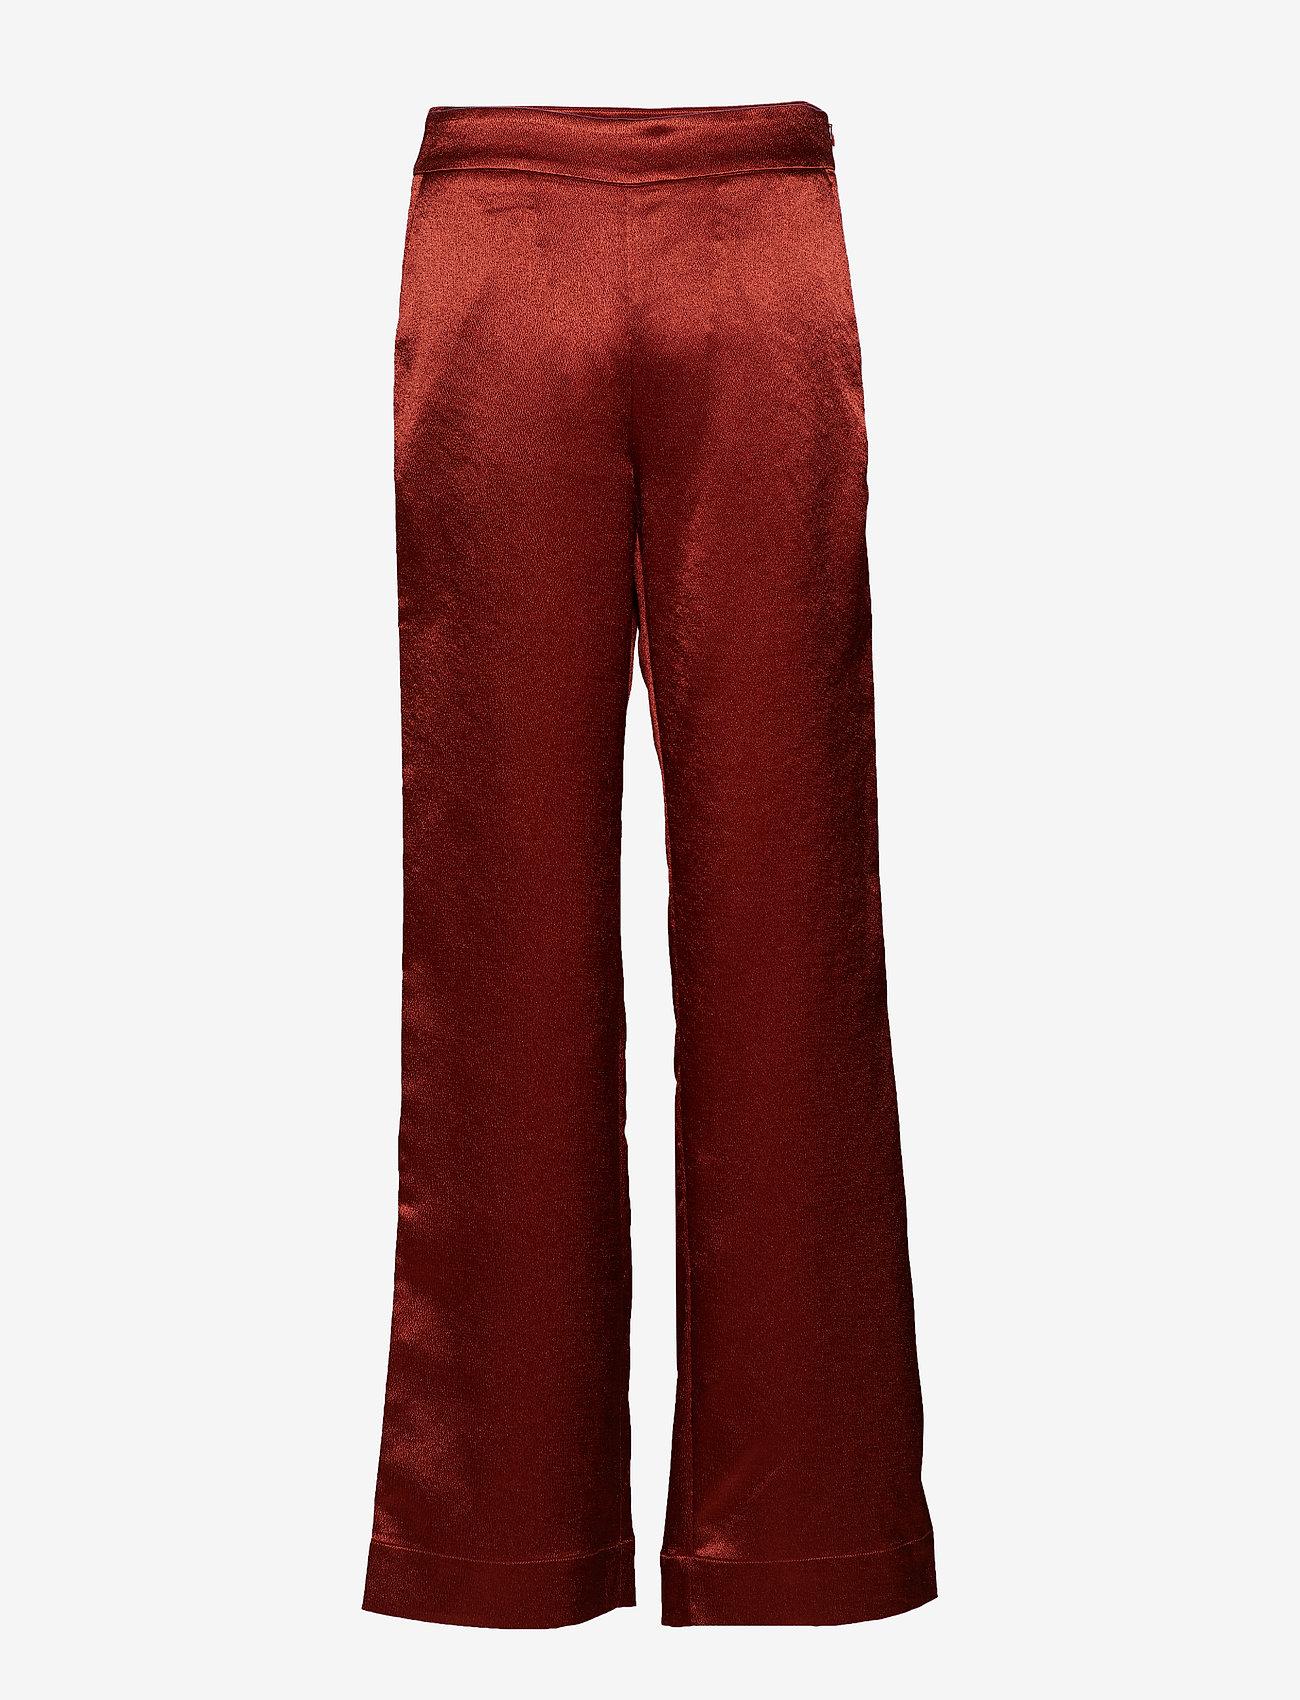 Gestuz - Nicola pants YE18 - bukser med brede ben - burned - 1